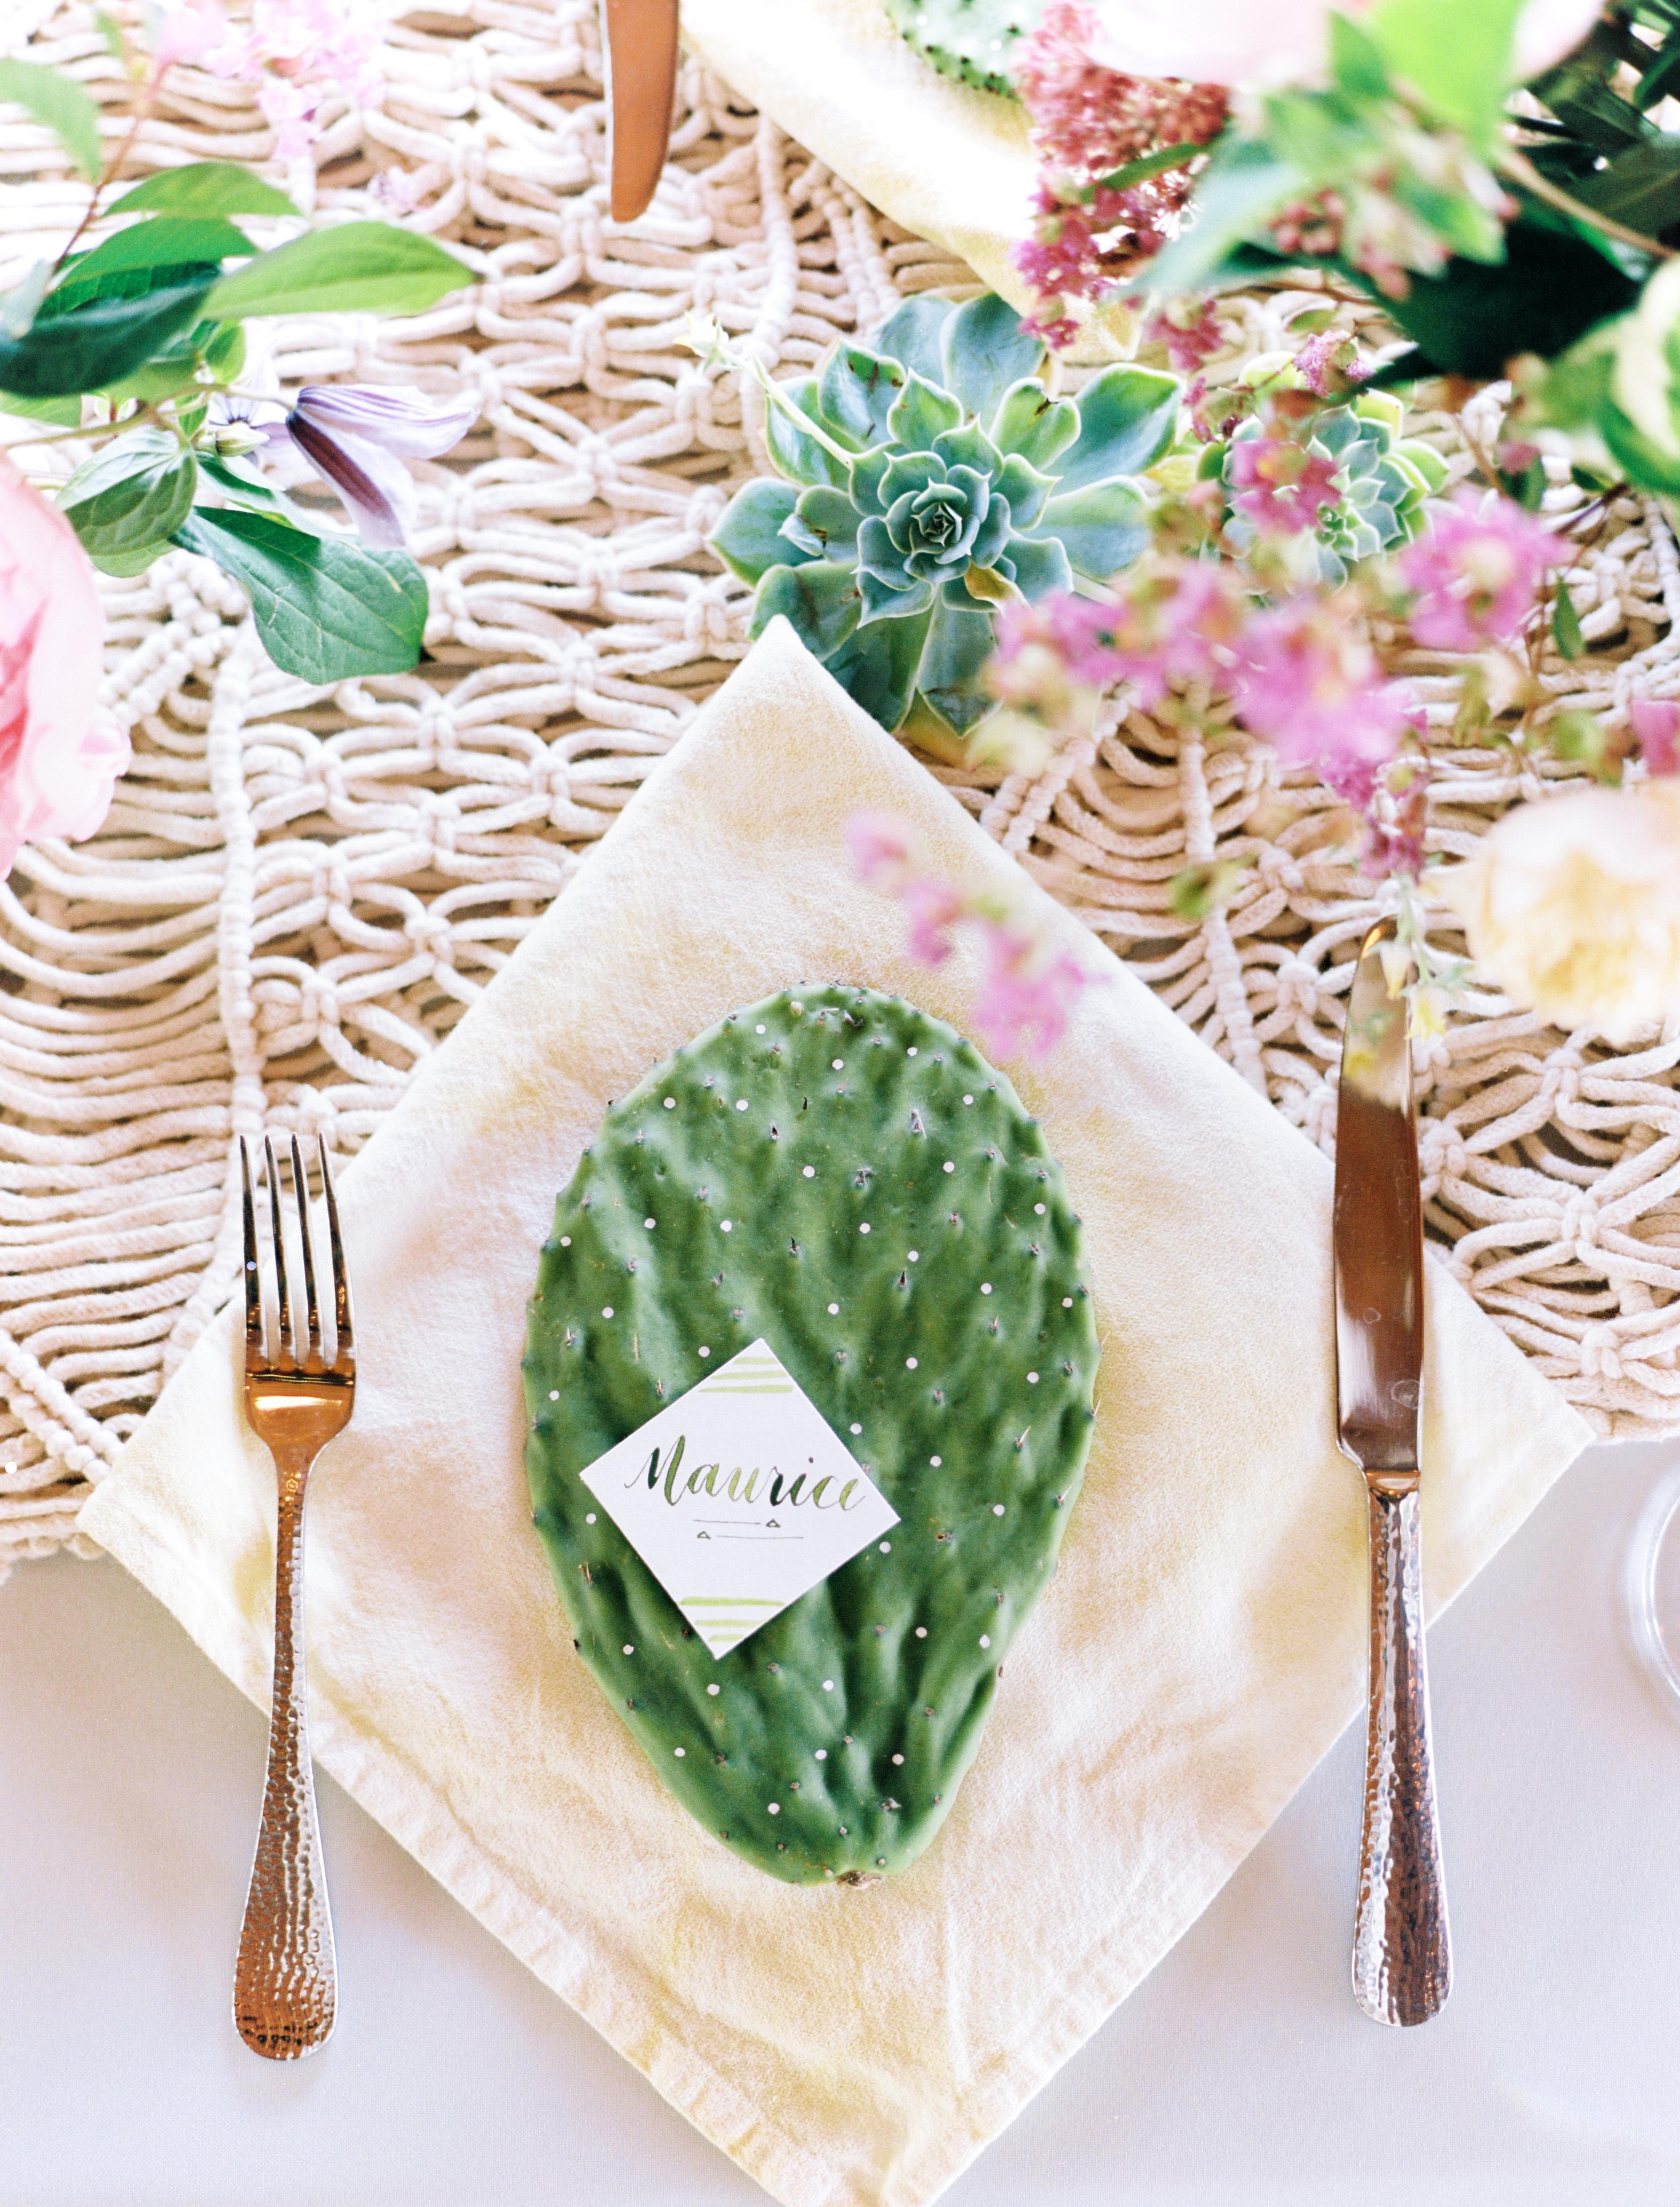 Cactus Place Card on Linen Napkin